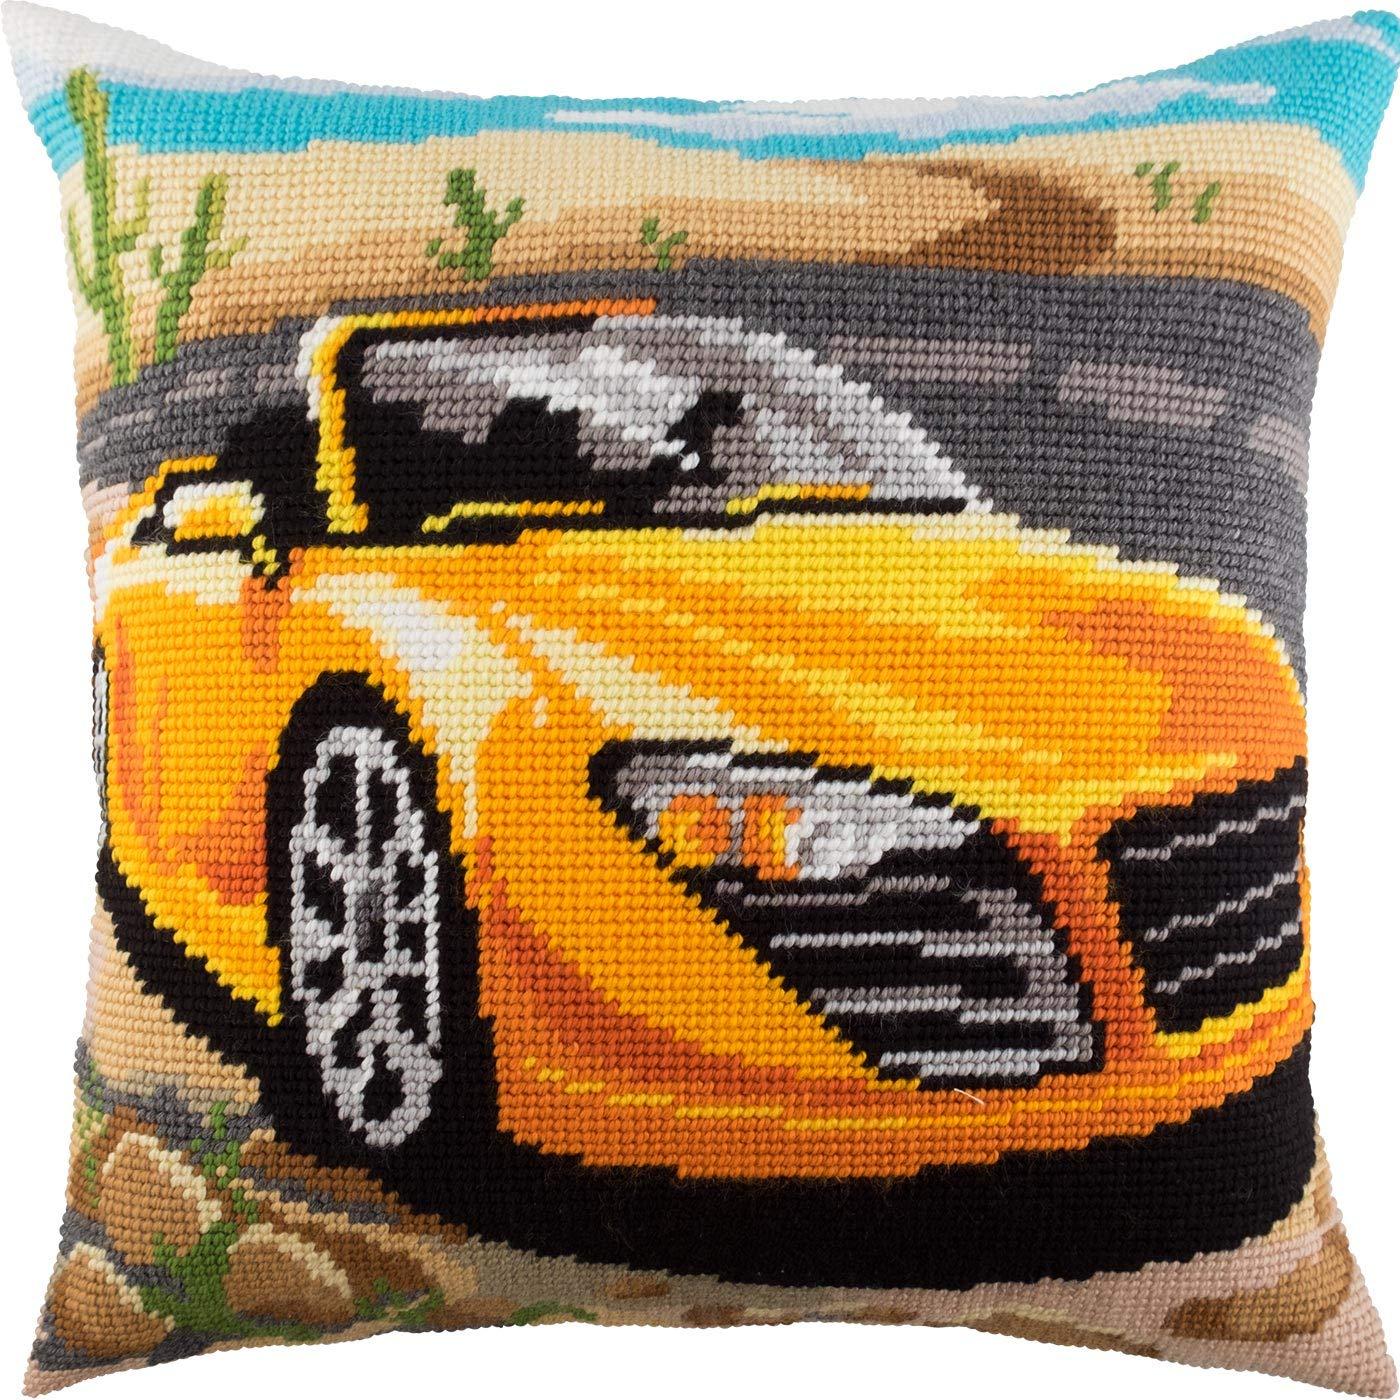 Stallion Throw Pillow 16/×16 Inches European Quality Needlepoint Kit Printed Tapestry Canvas